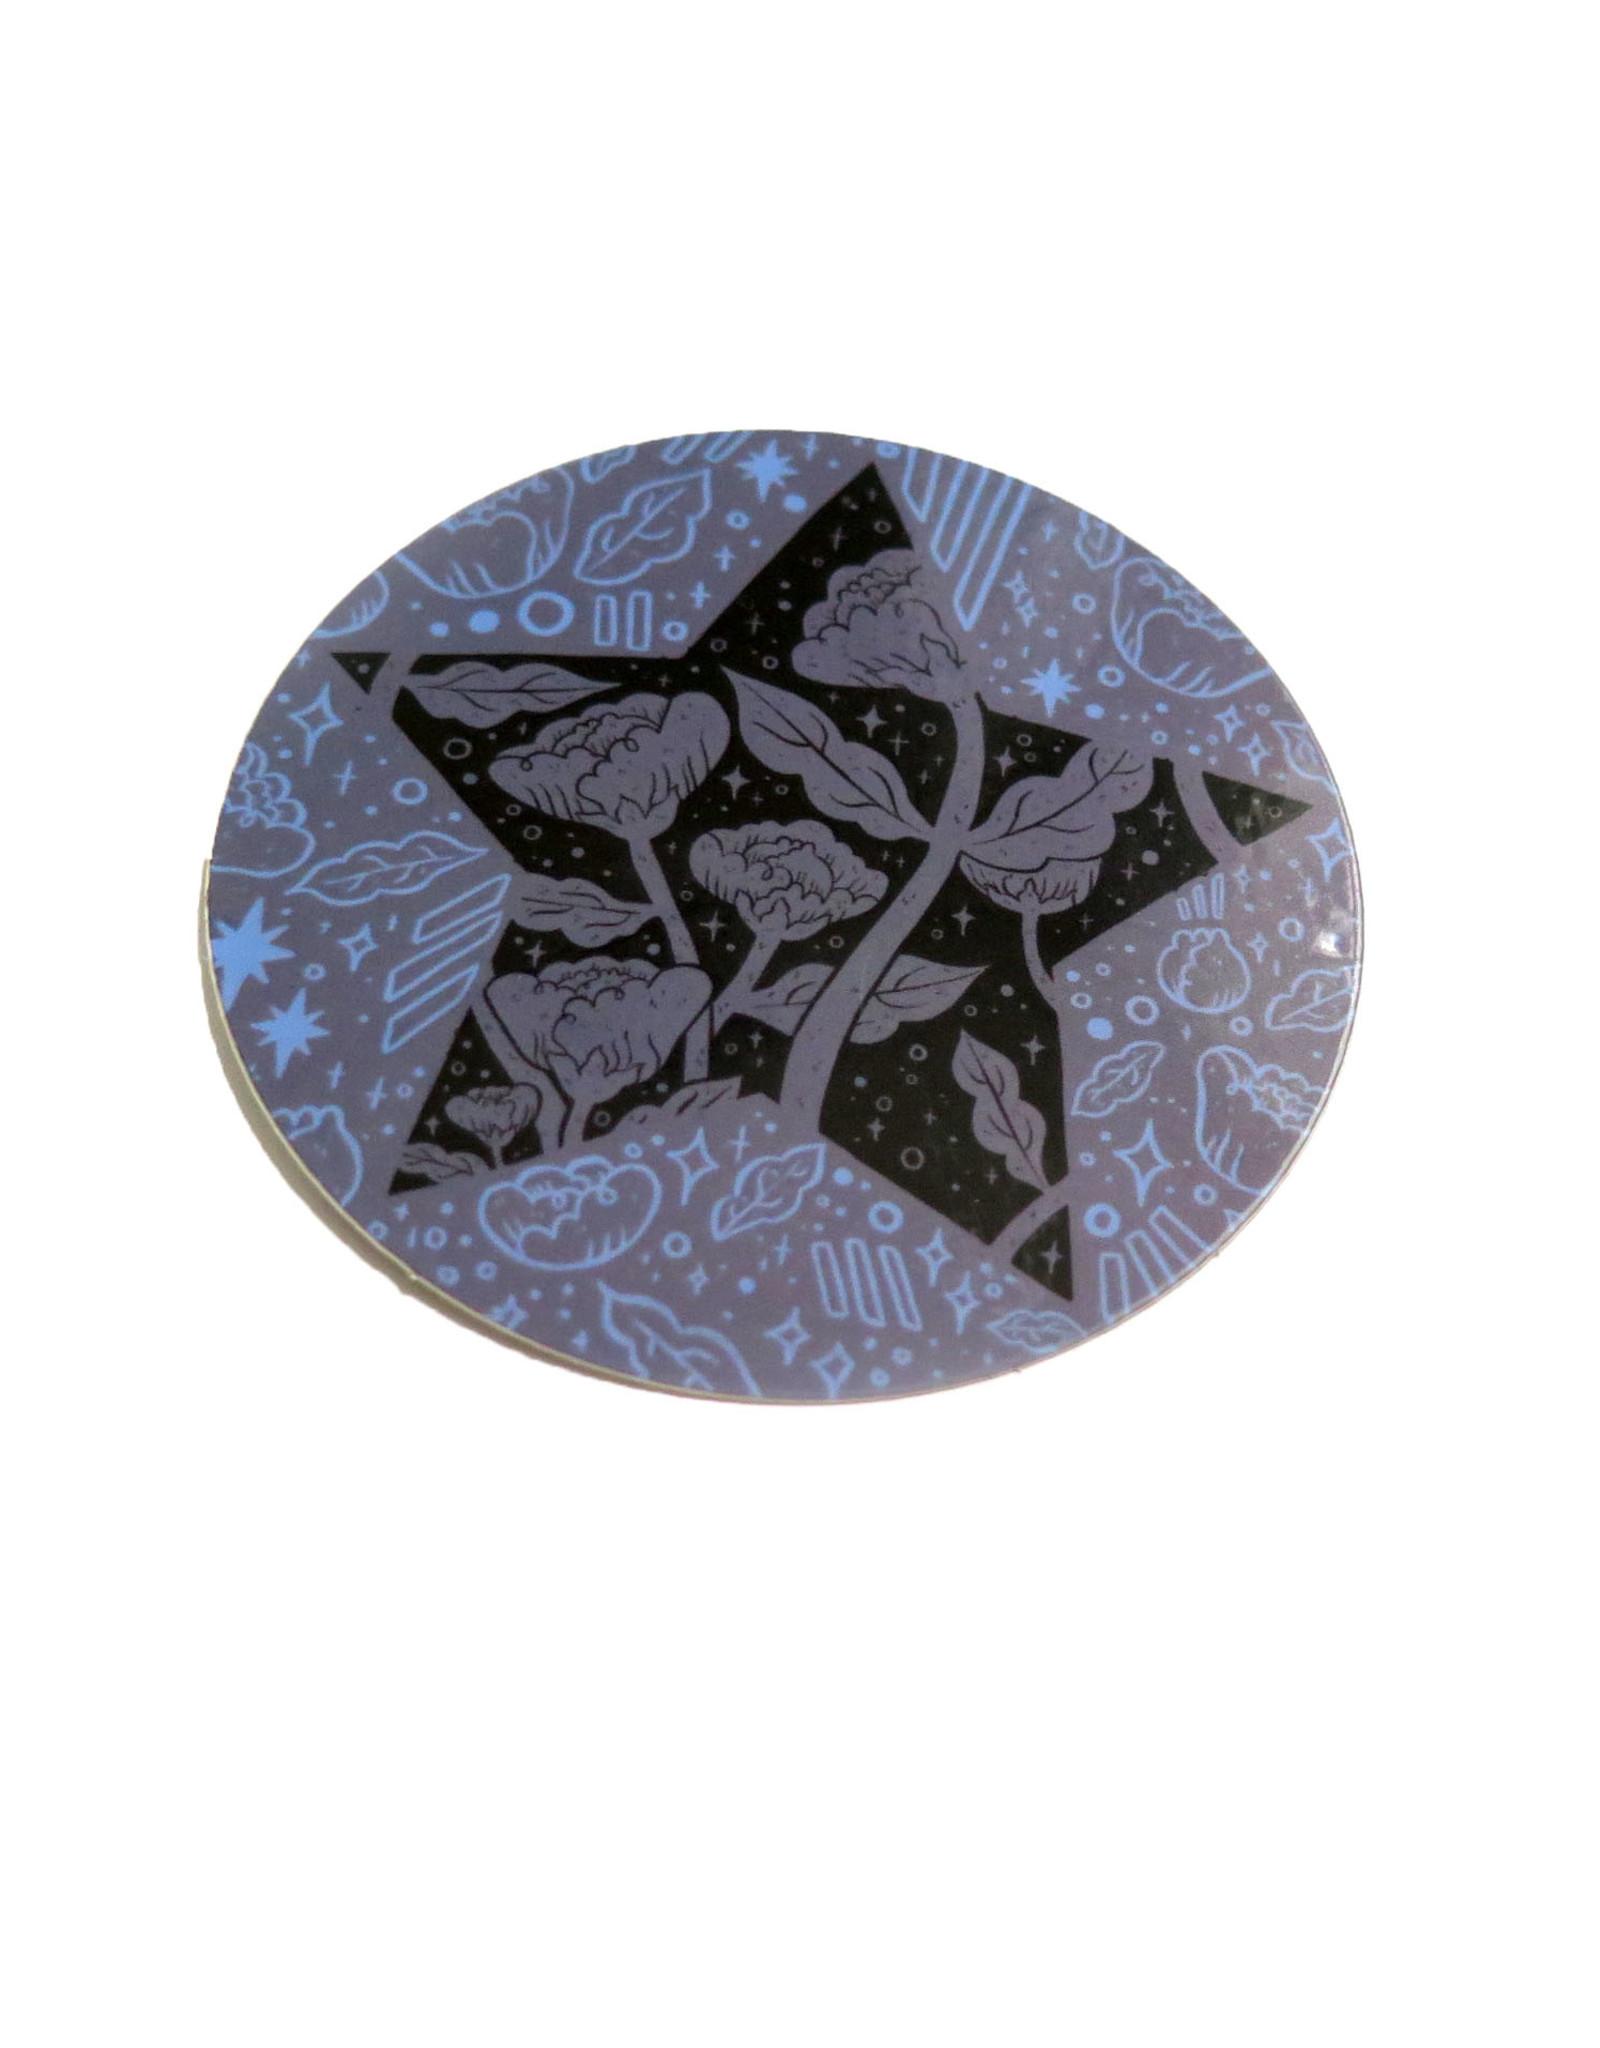 Manifest 2021 Waterproof Circle Sticker